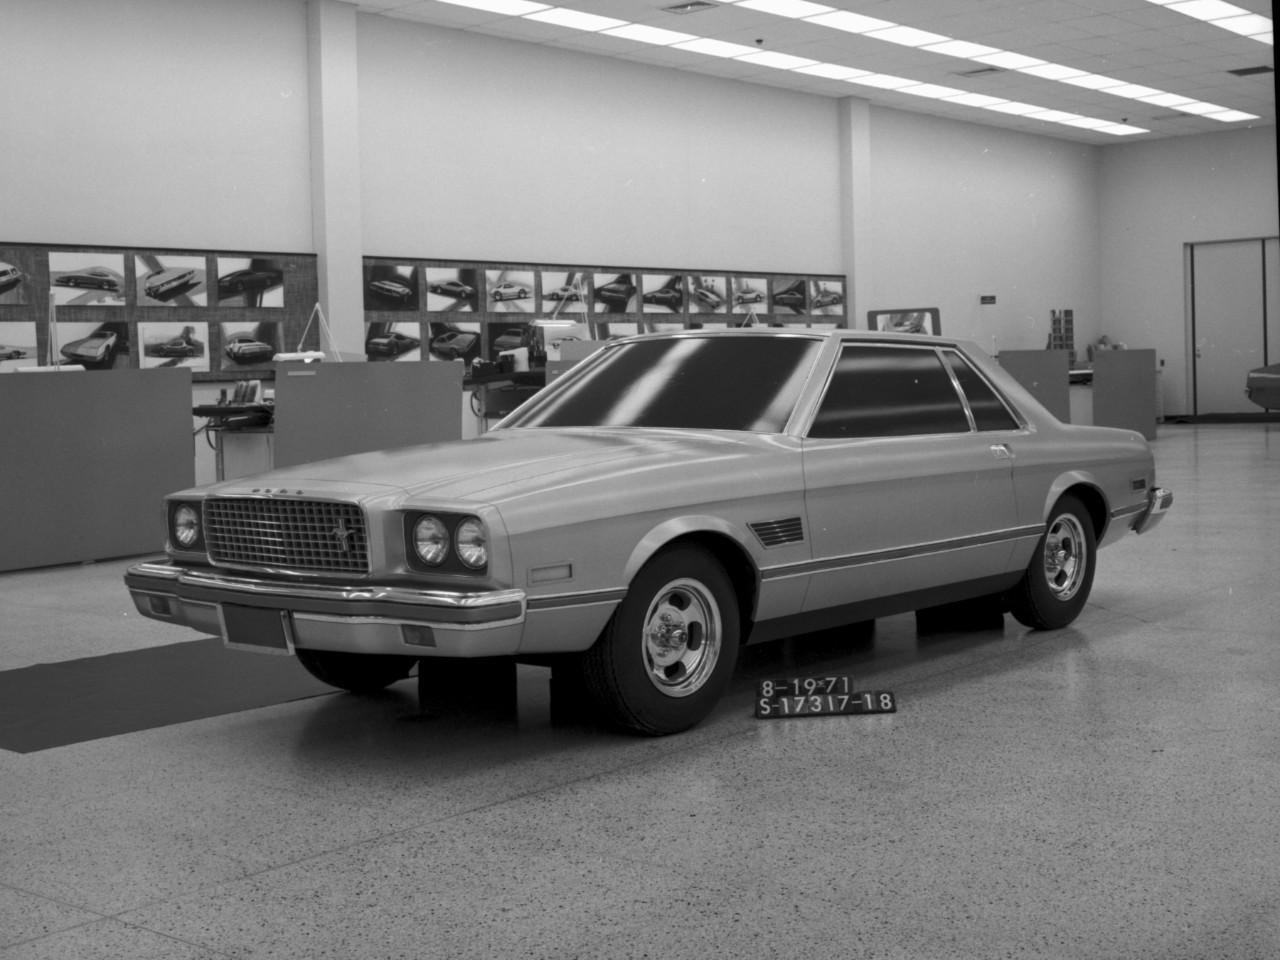 Granada style Mustang II